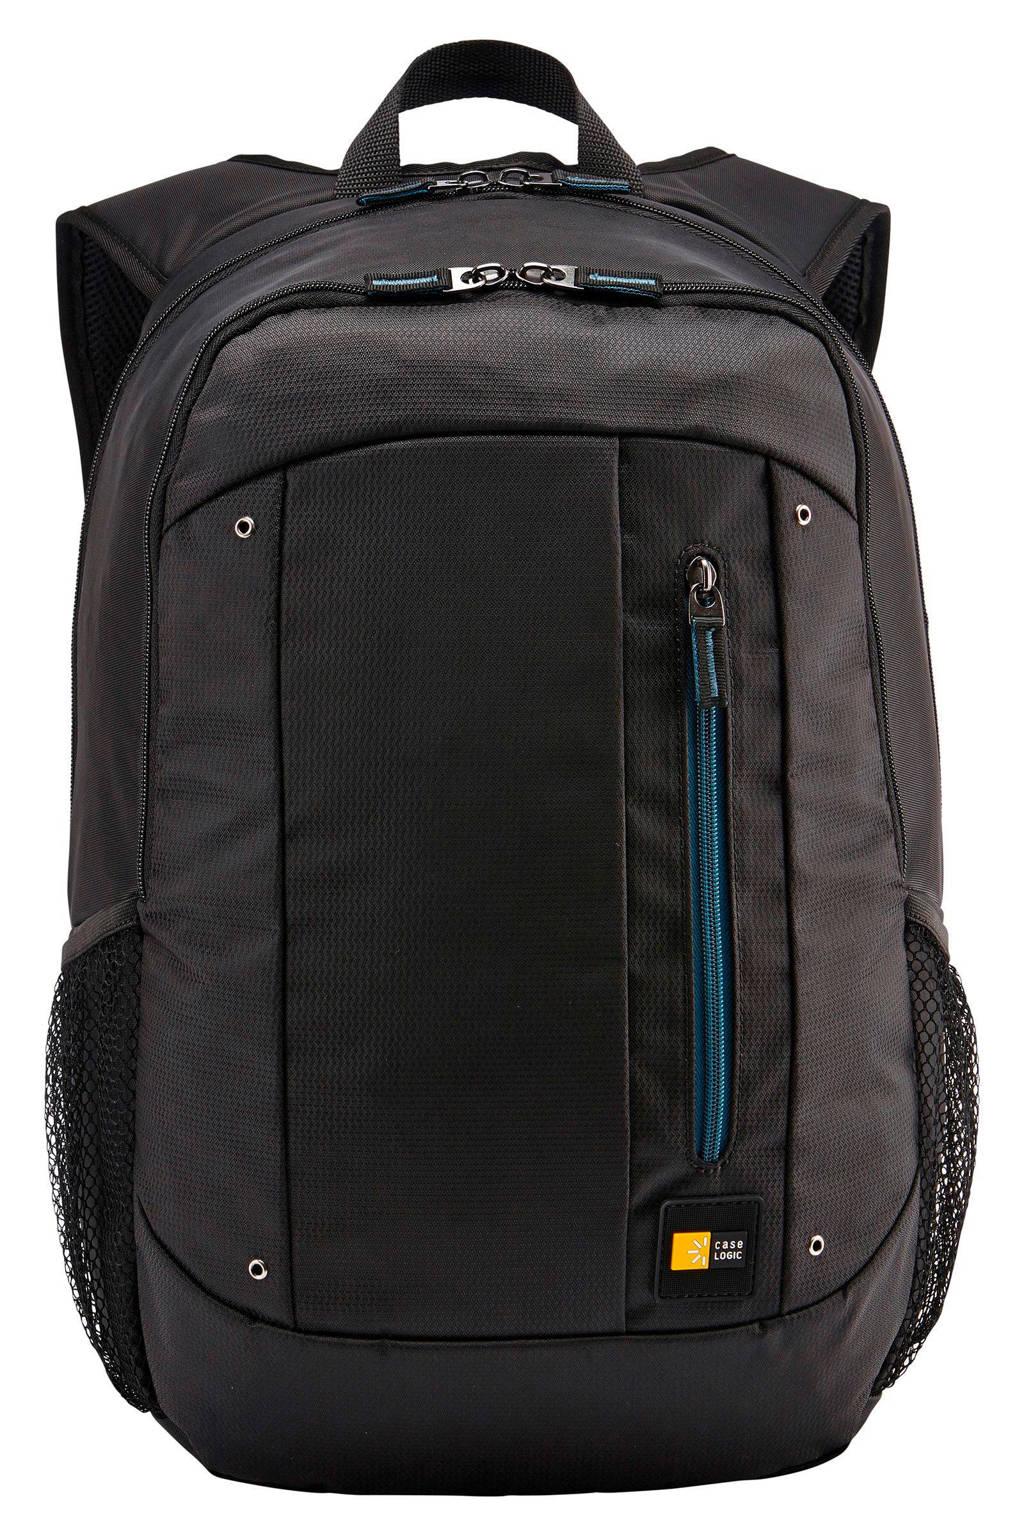 Case Logic Jaunt 15,6 inch laptoptas rugzak, Zwart